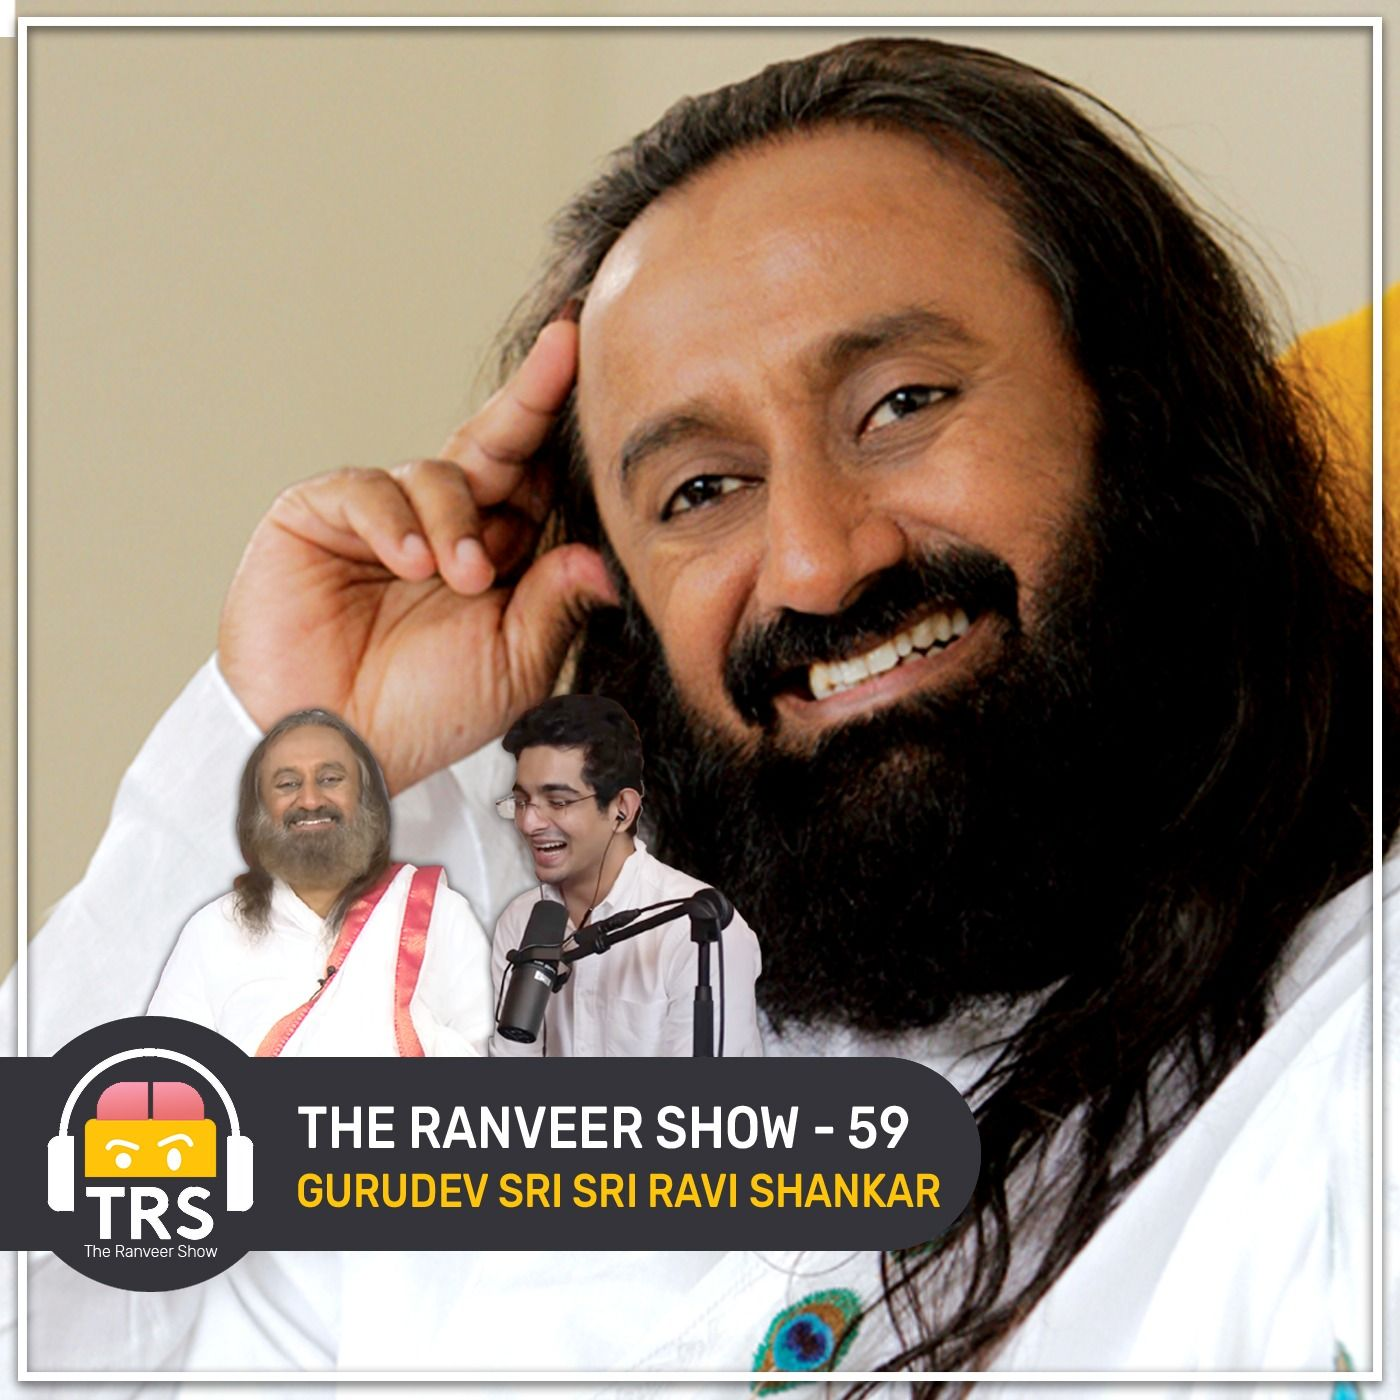 Gurudev Sri Sri Ravi Shankar On Covid-19, Meditation, Celibacy And More   The Ranveer Show 59